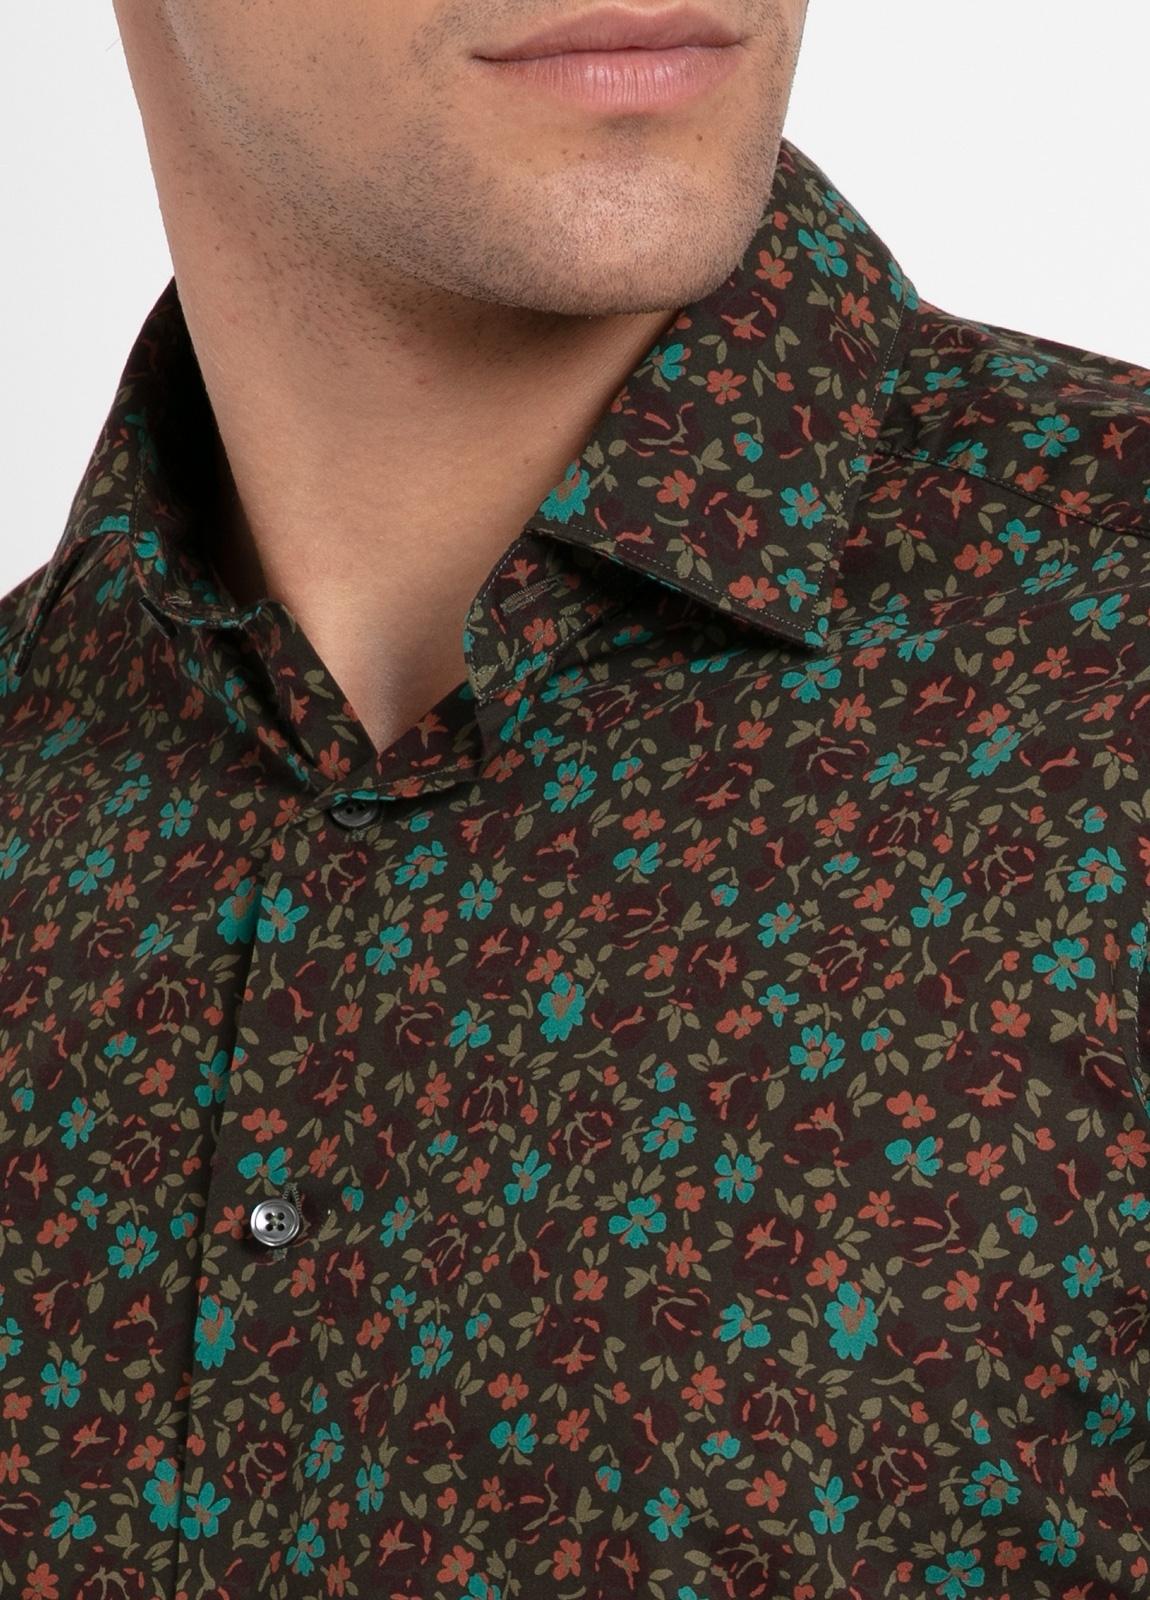 Camisa sport SLIM FIT modelo LEO estampado floral fondo marrón, 100% Algodón. - Ítem1